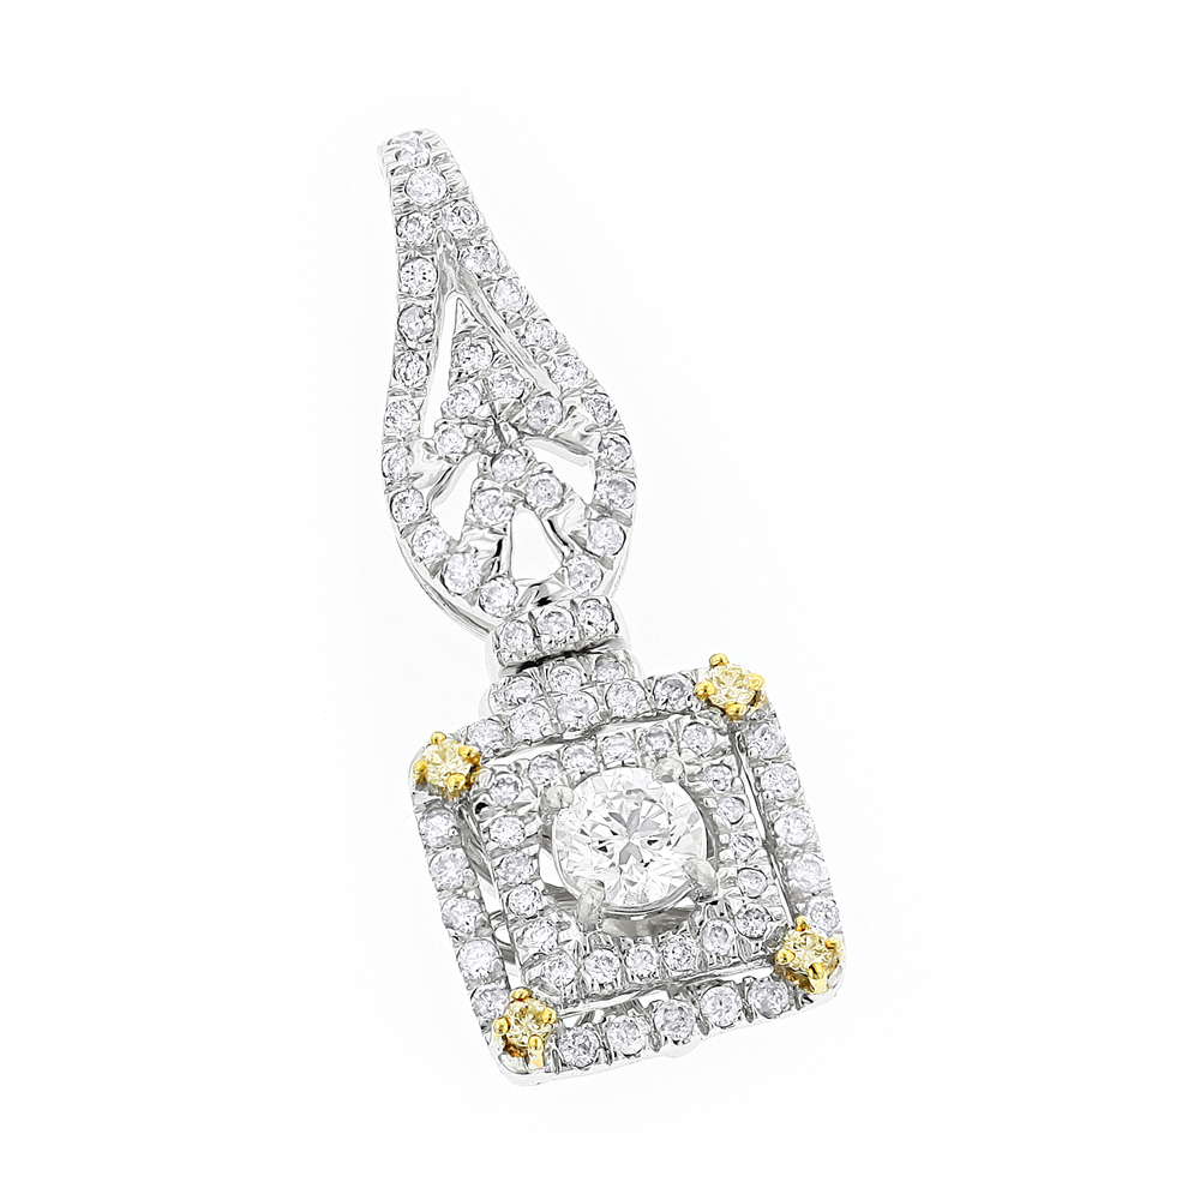 Designer Jewelry: Ladies White and Yellow Diamond Pendant 0.8ct 14K Gold